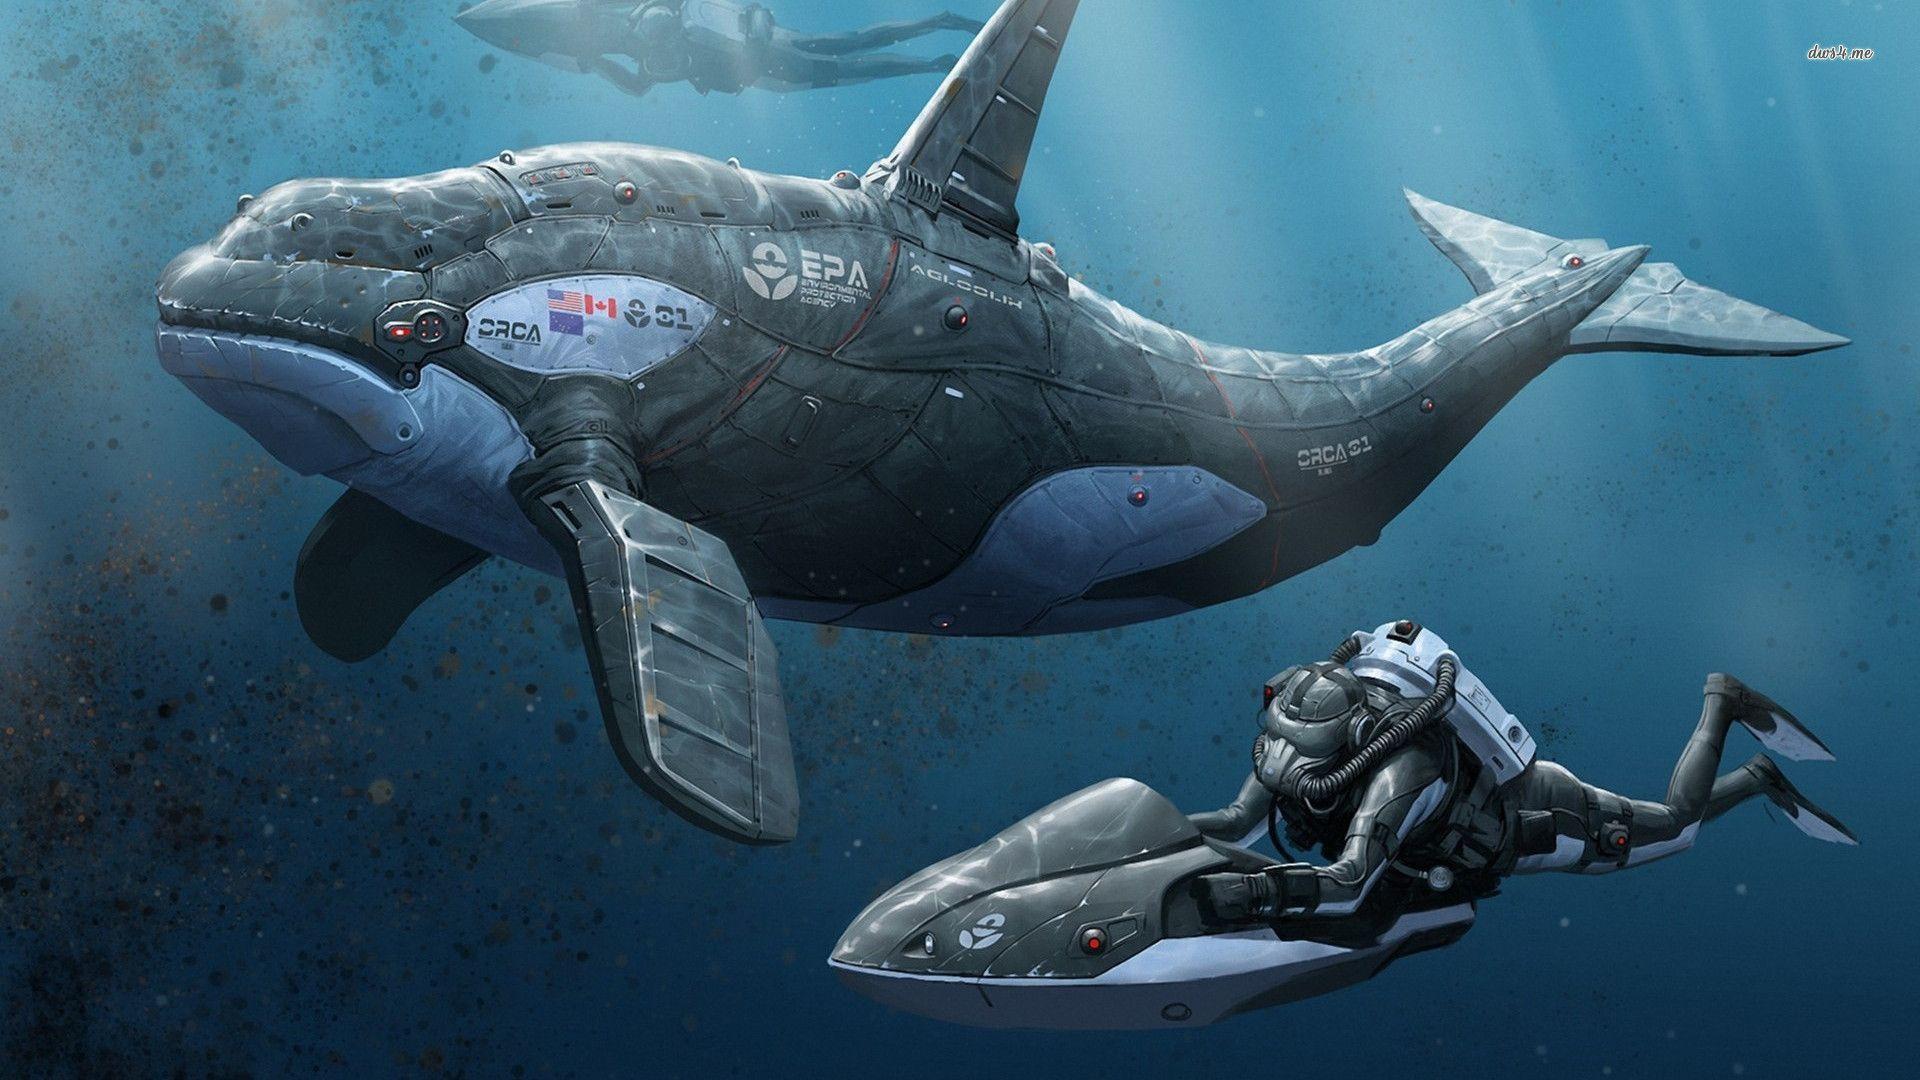 Divers and a robotic orca wallpaper - Fantasy wallpapers - #